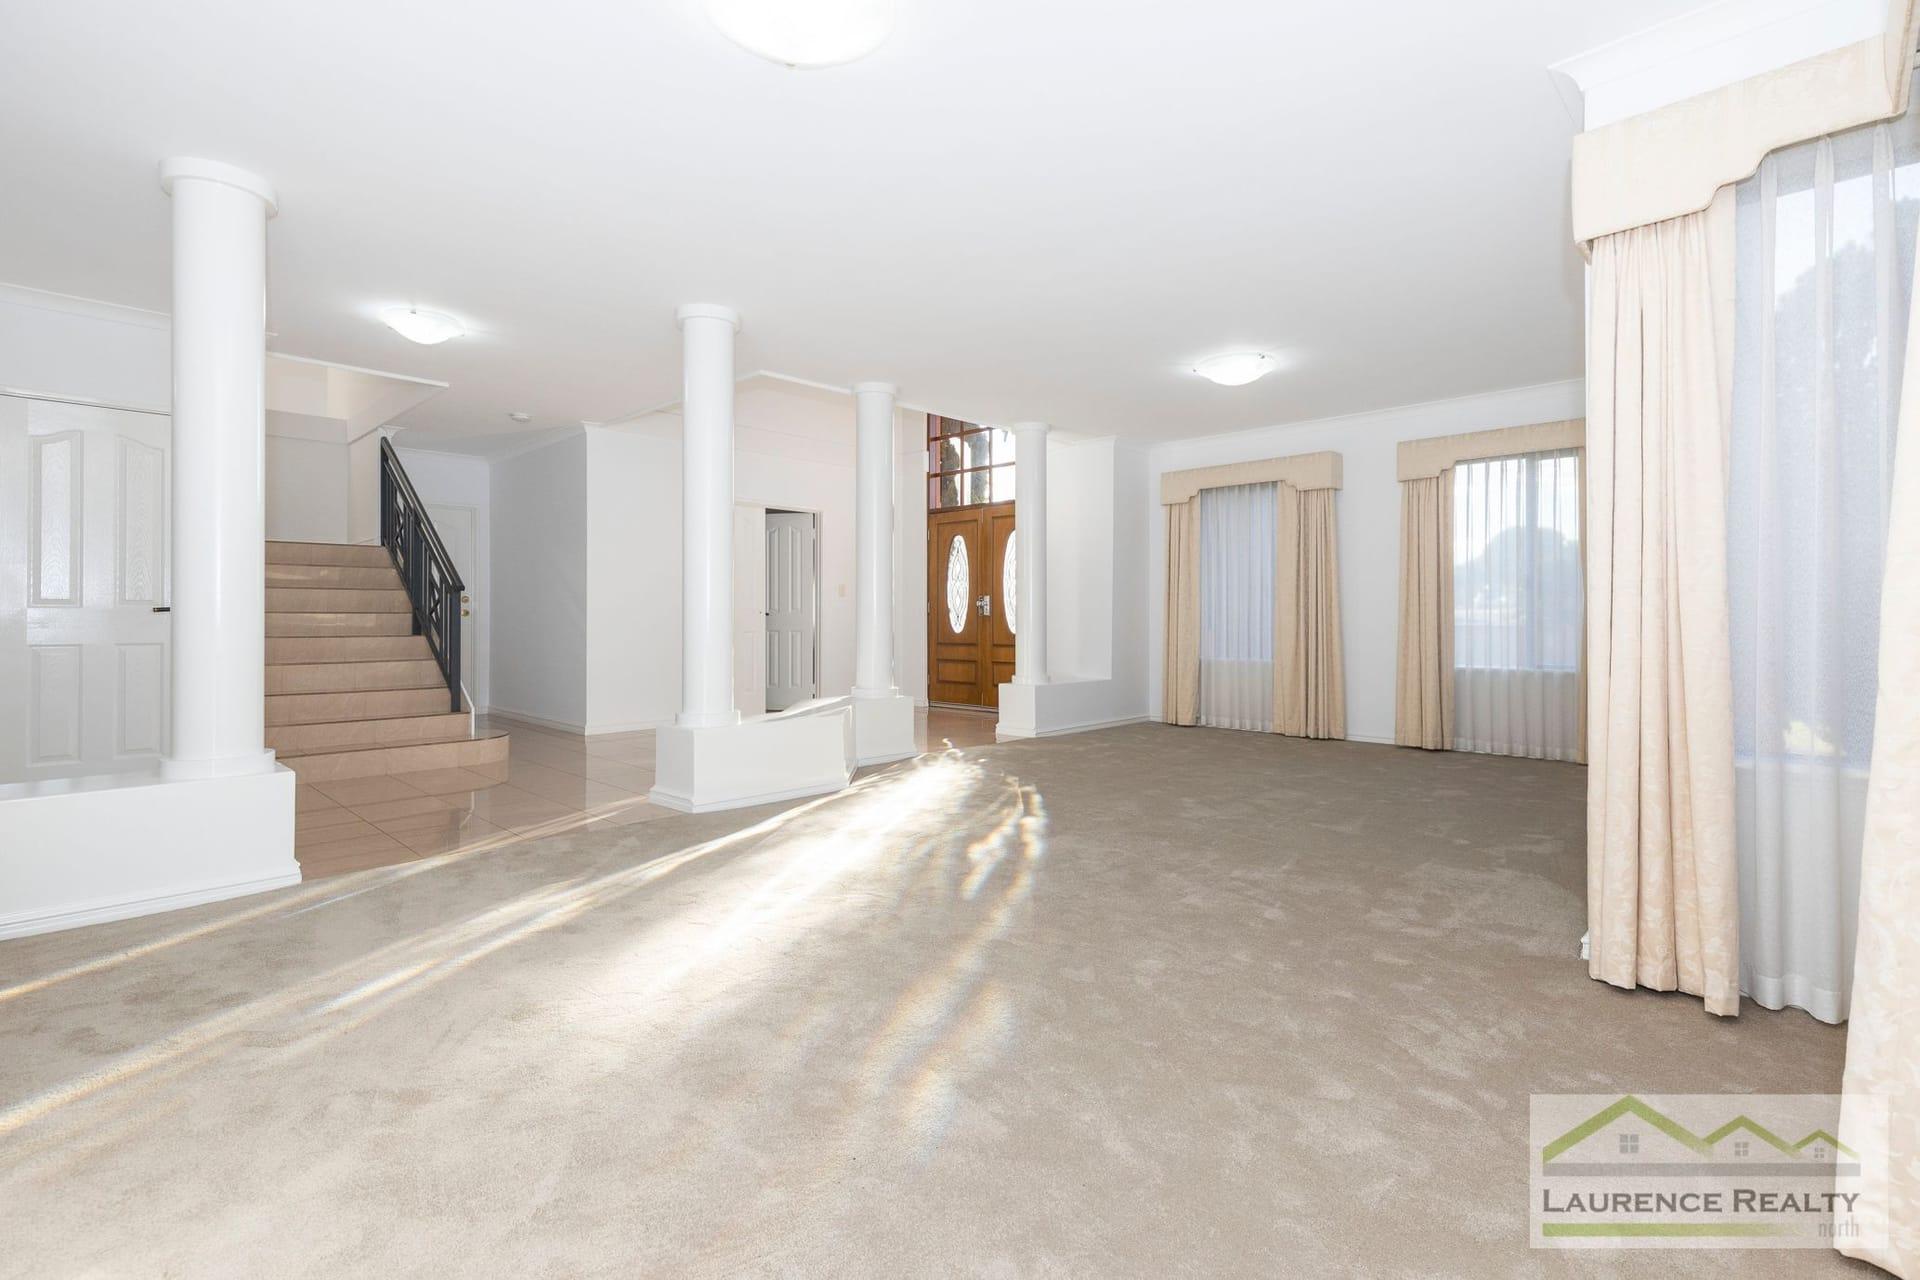 Property 5 Seville Crest, Mindarie WA 6030 IMAGE